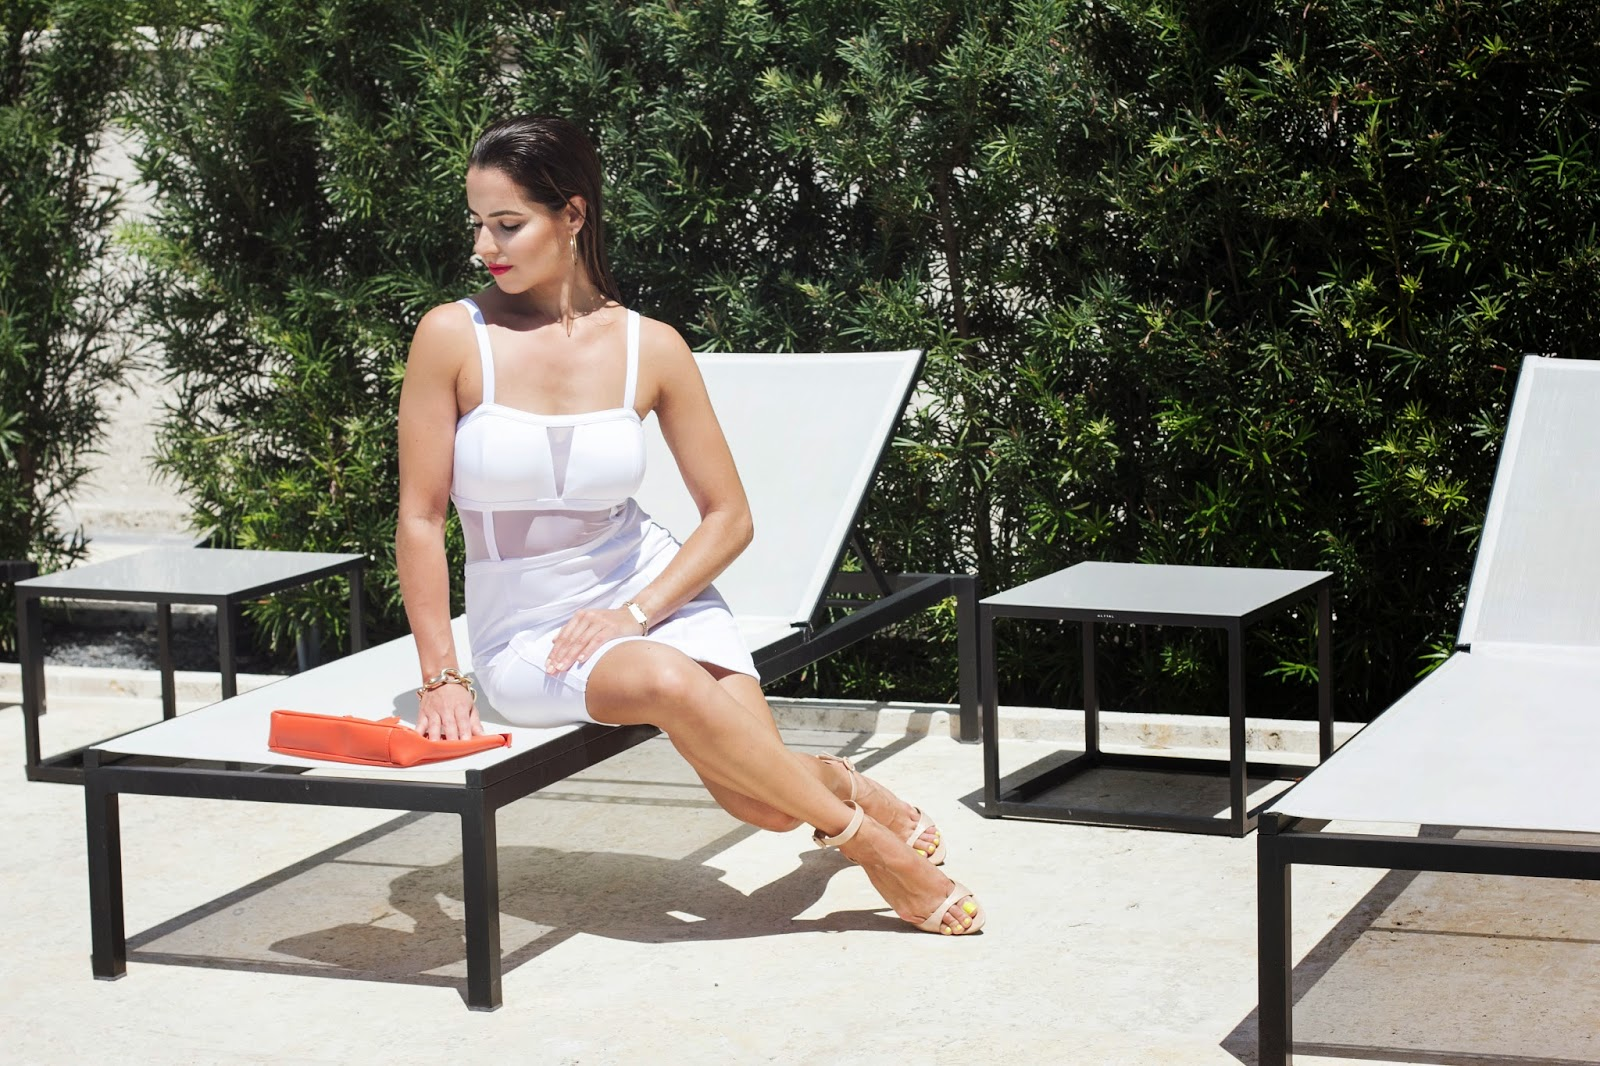 Beauty Fashion Xoxo: Kelly Saks, A Miami Style Blog